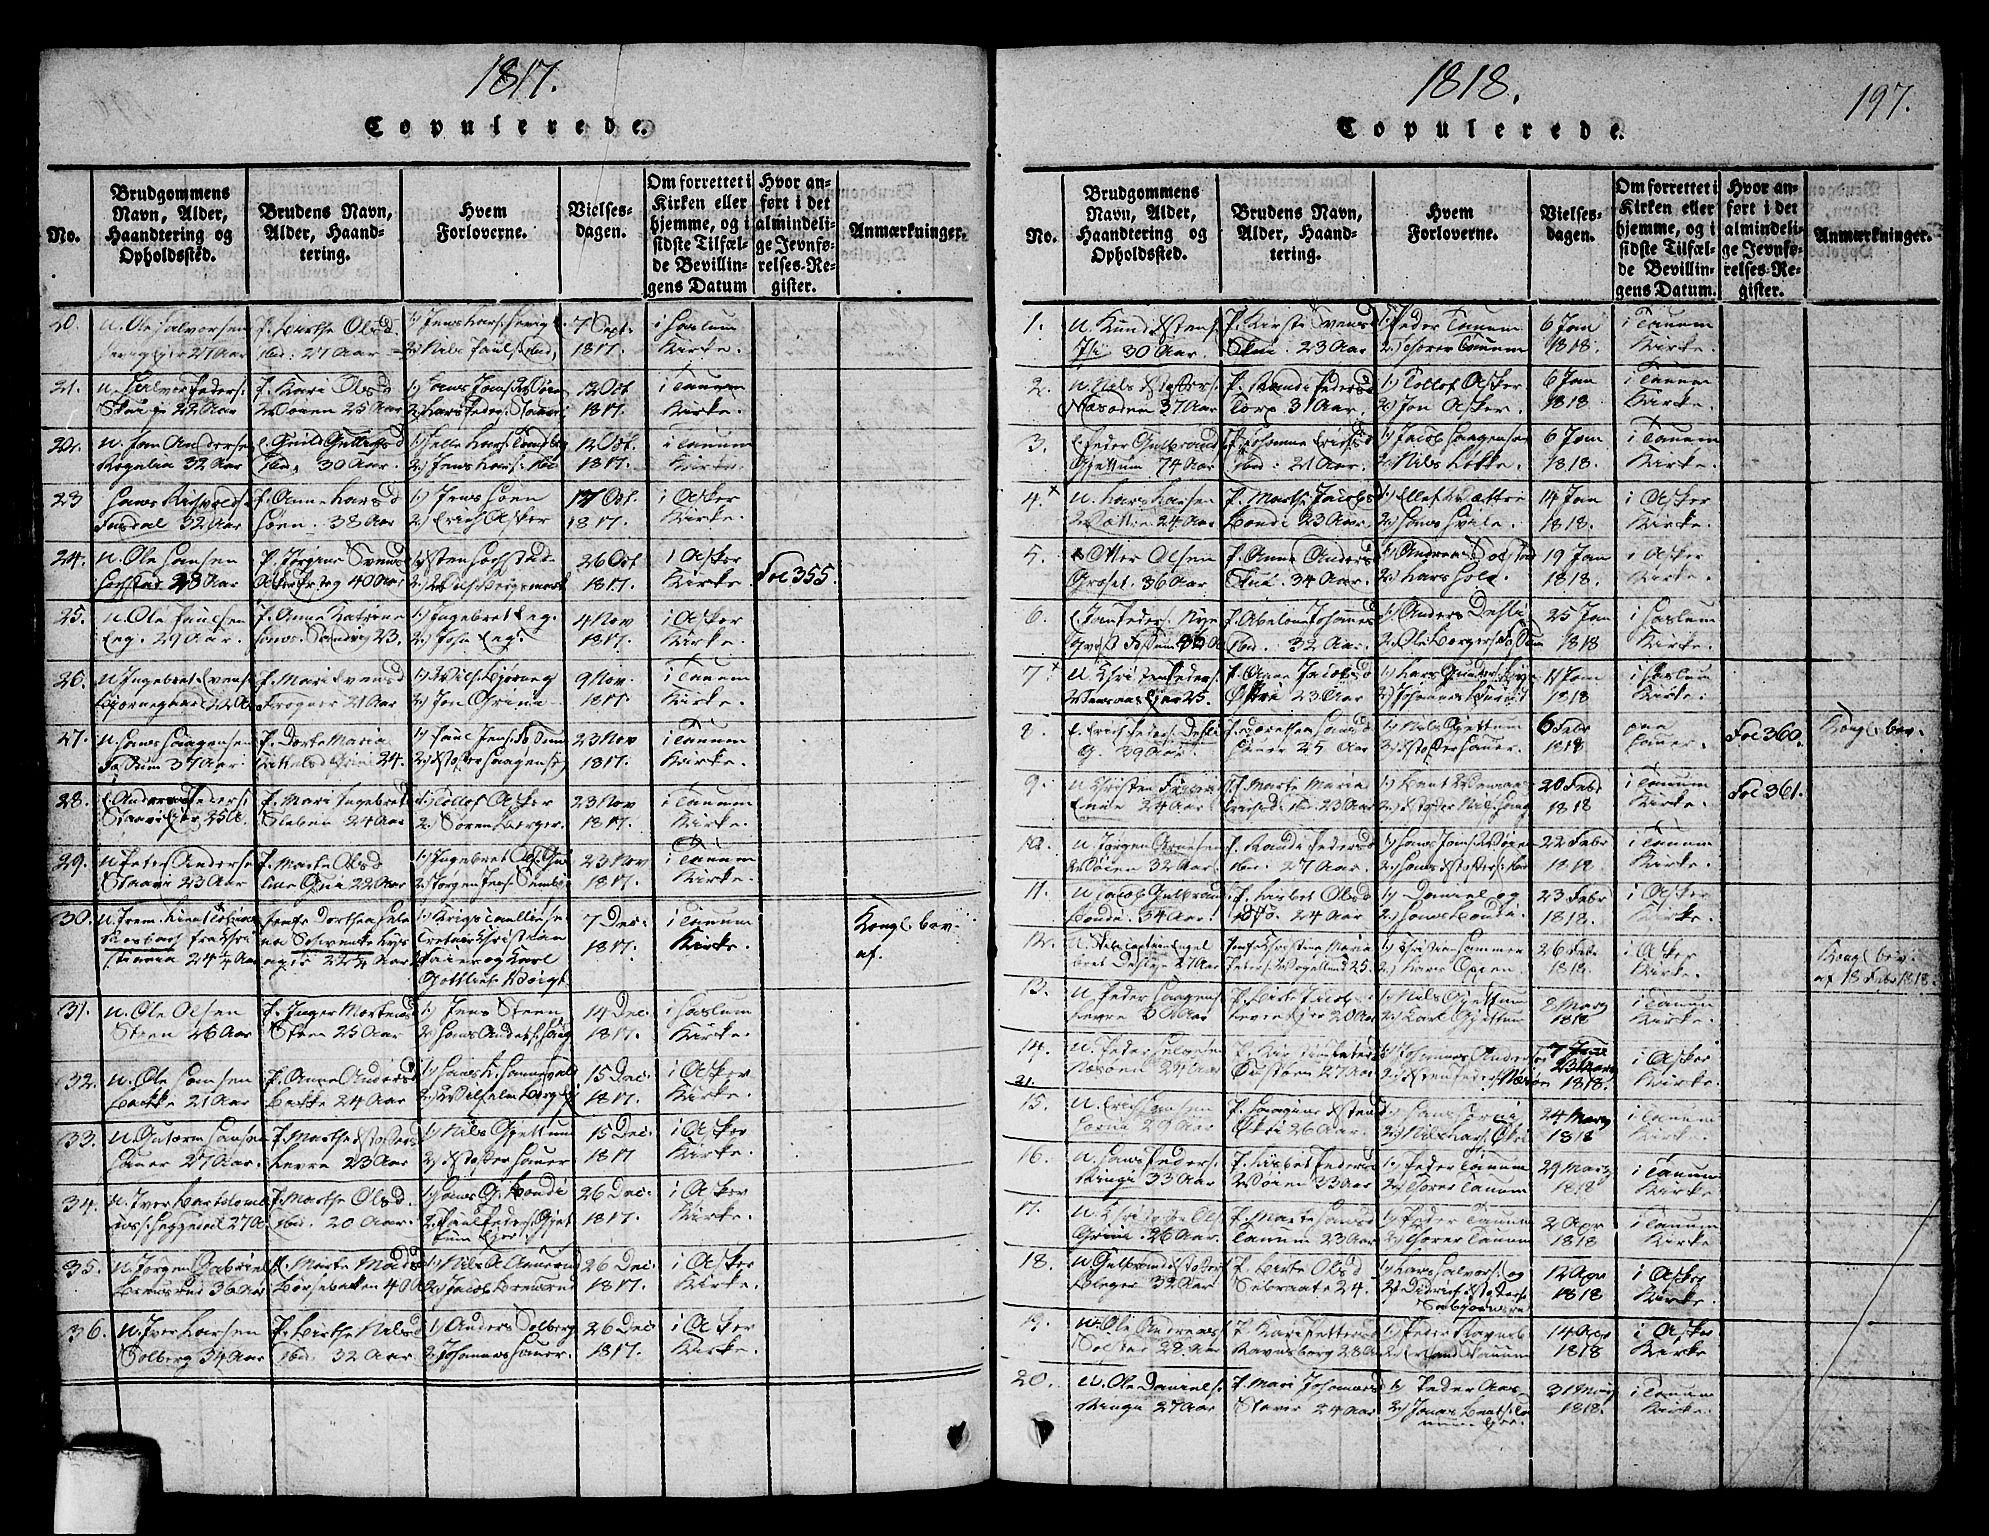 SAO, Asker prestekontor Kirkebøker, G/Ga/L0001: Klokkerbok nr. I 1, 1814-1830, s. 197